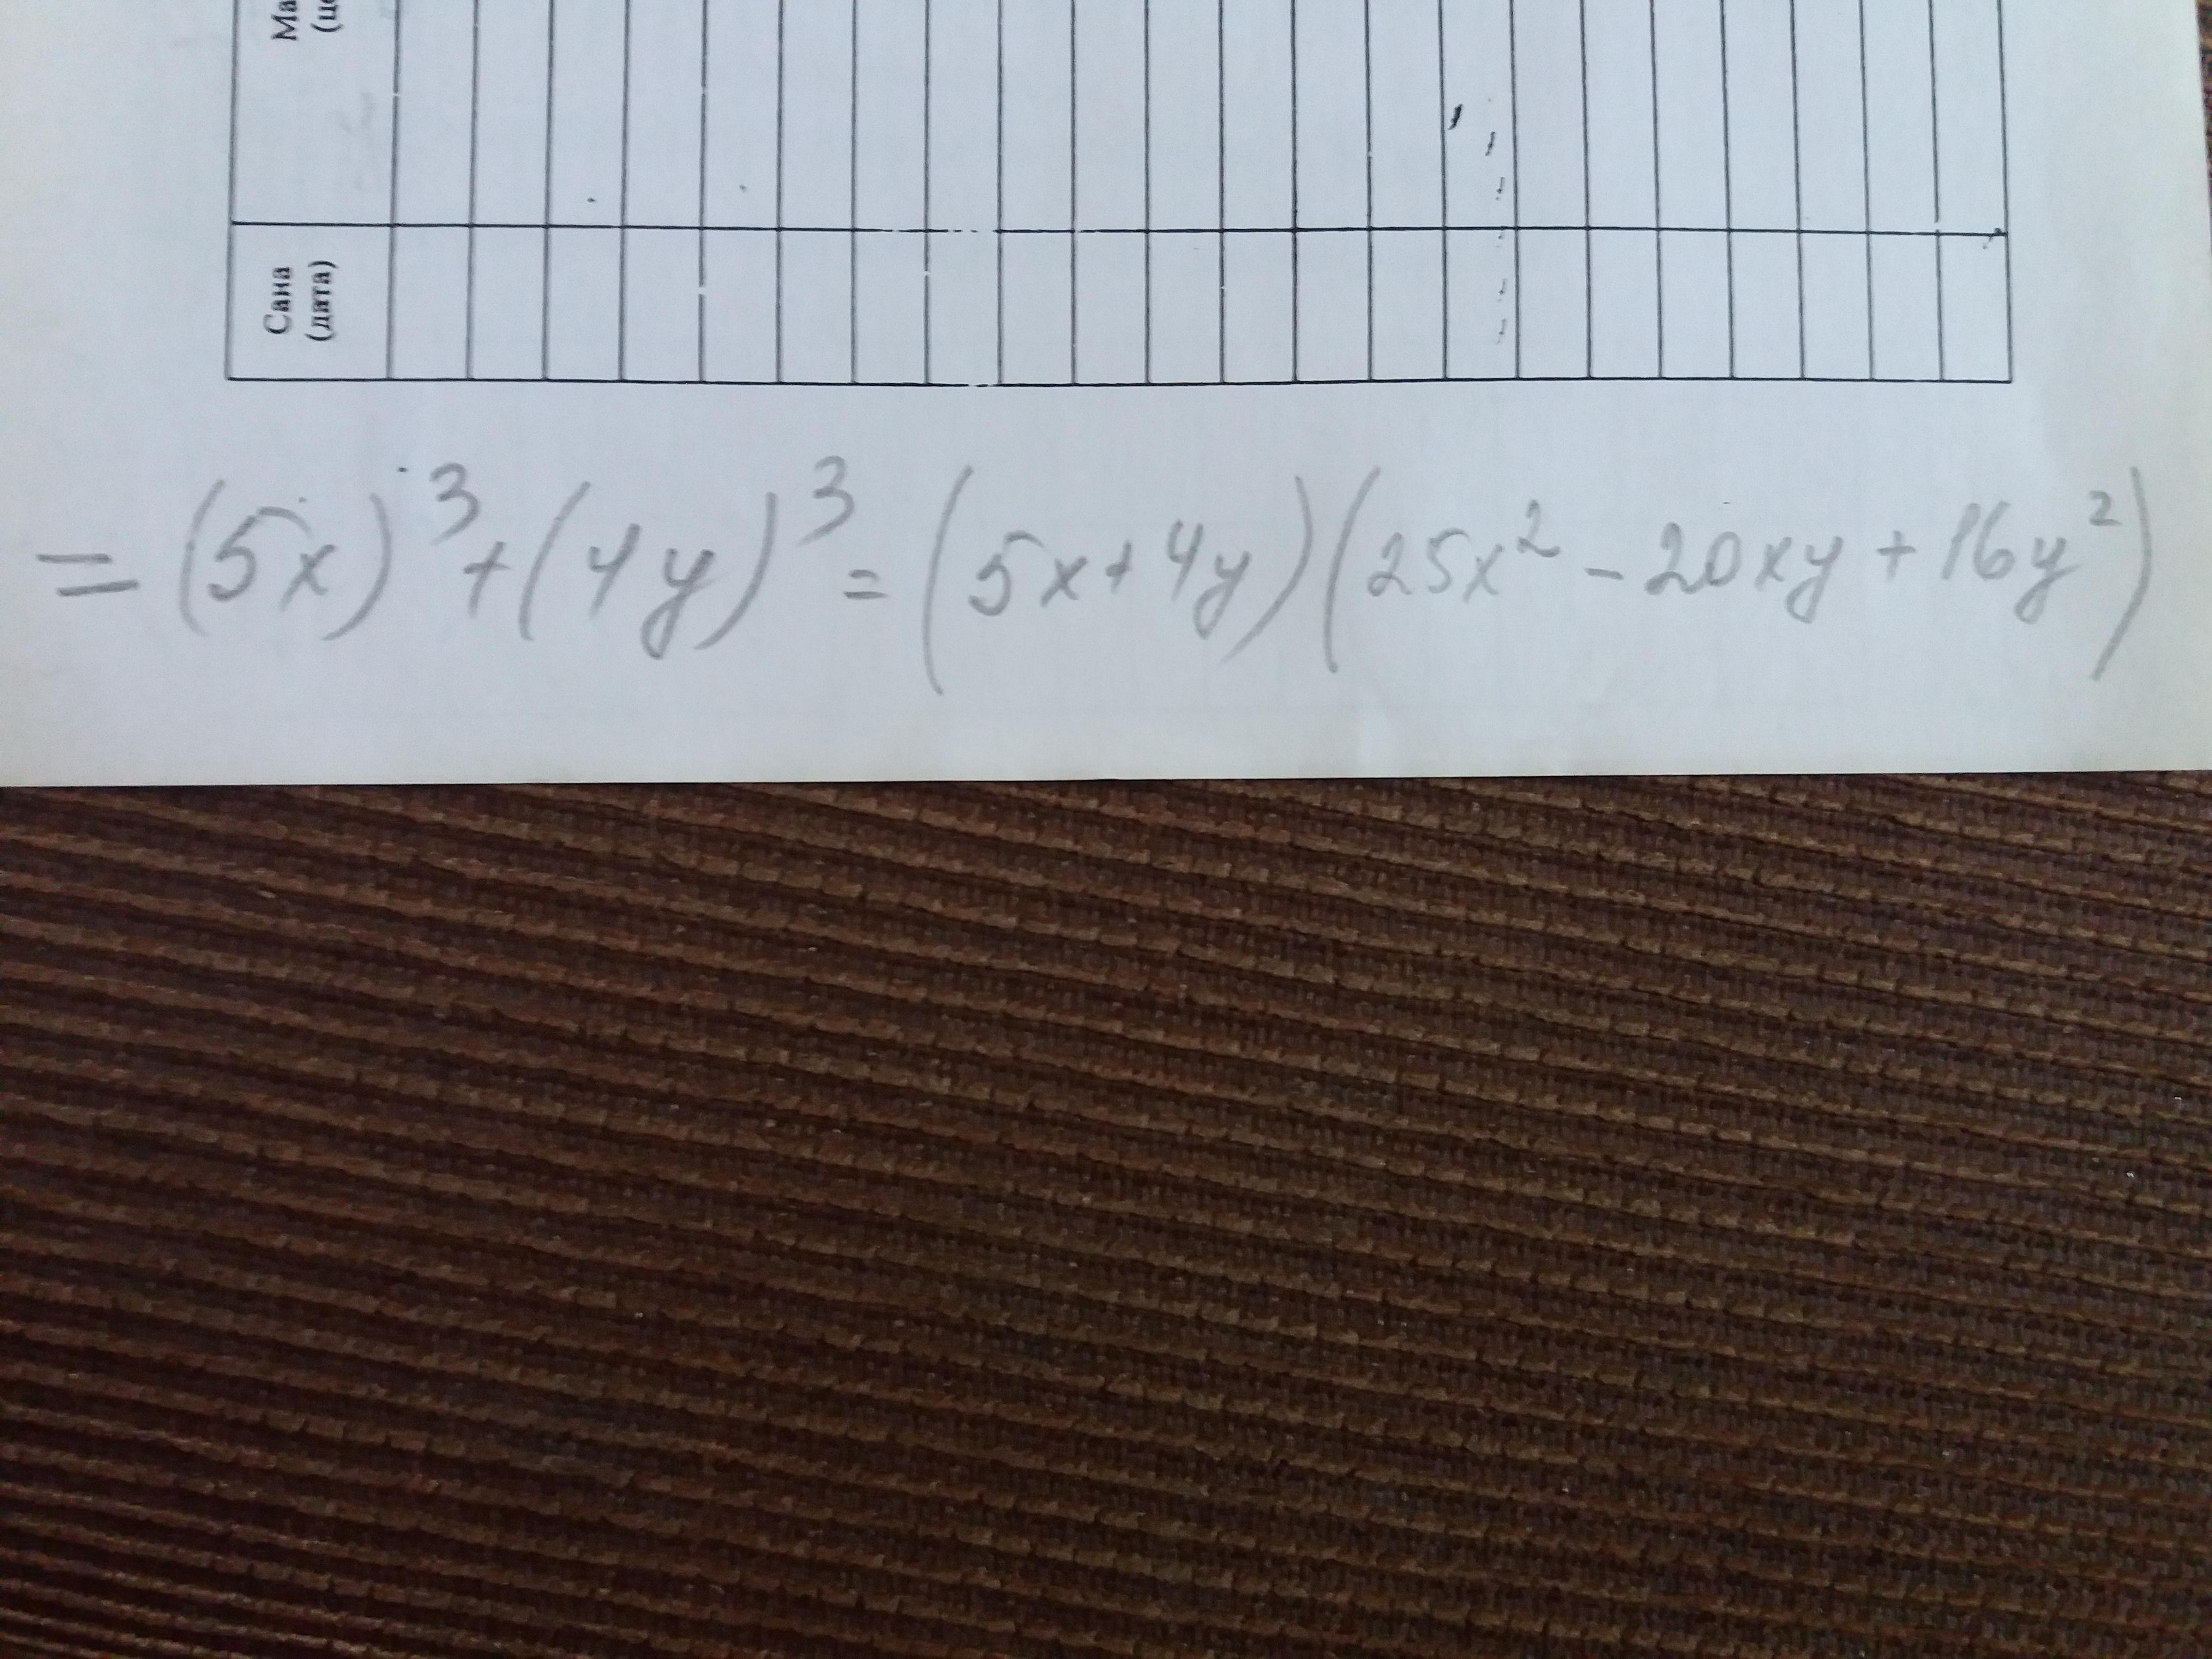 Разложитье на множители 125х^3+64у^3